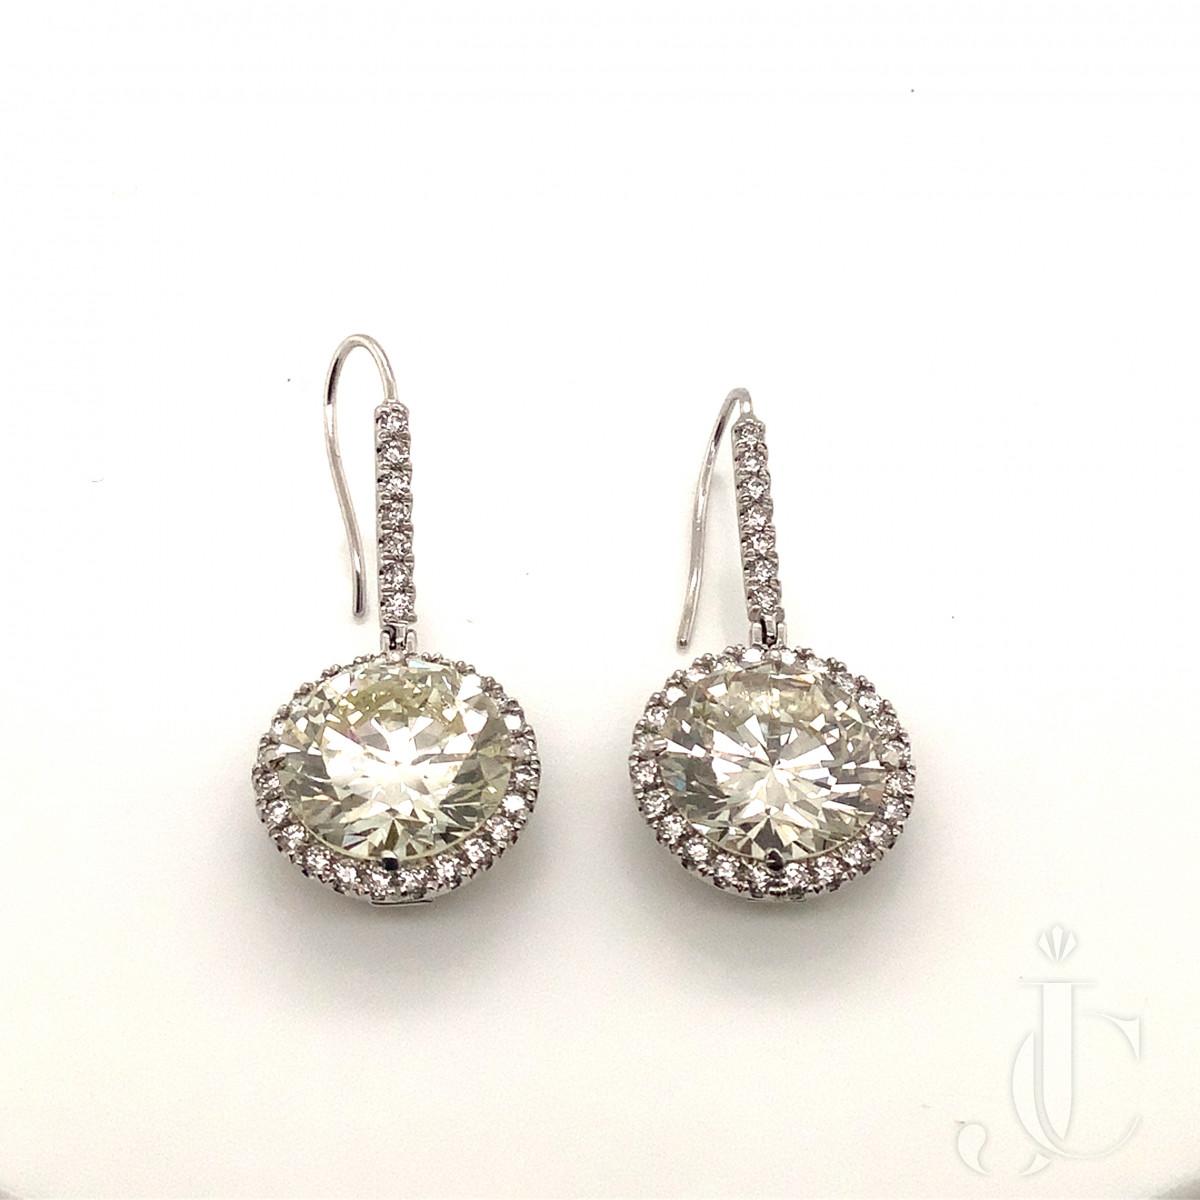 Important Pair of Diamond Drop Earrings